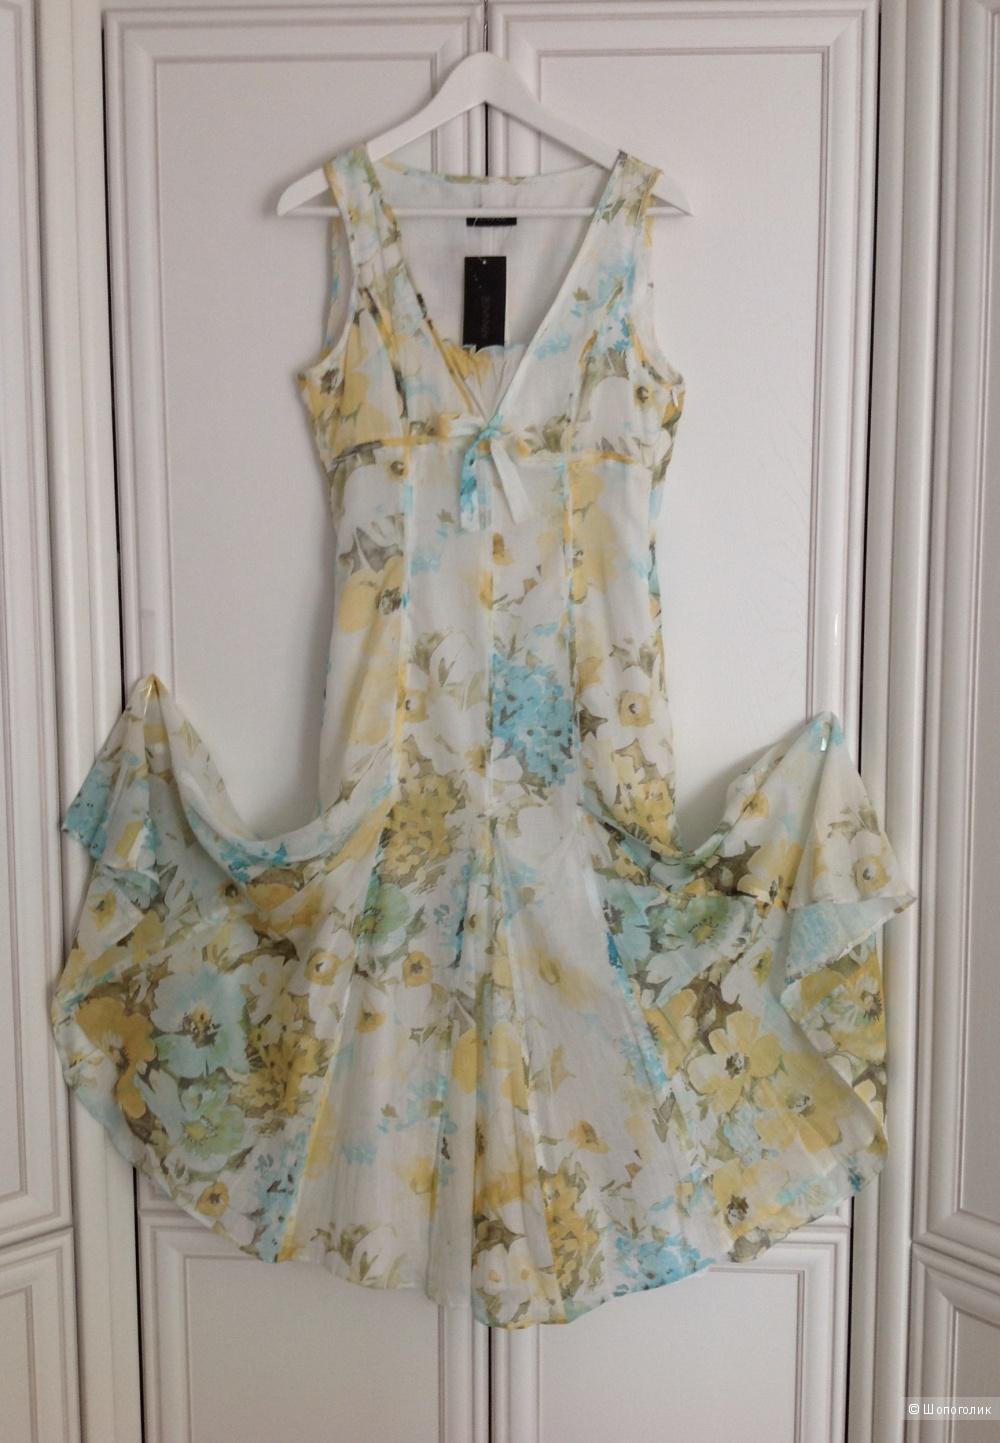 Батистовое платье Apanage (Германия), размер 44.